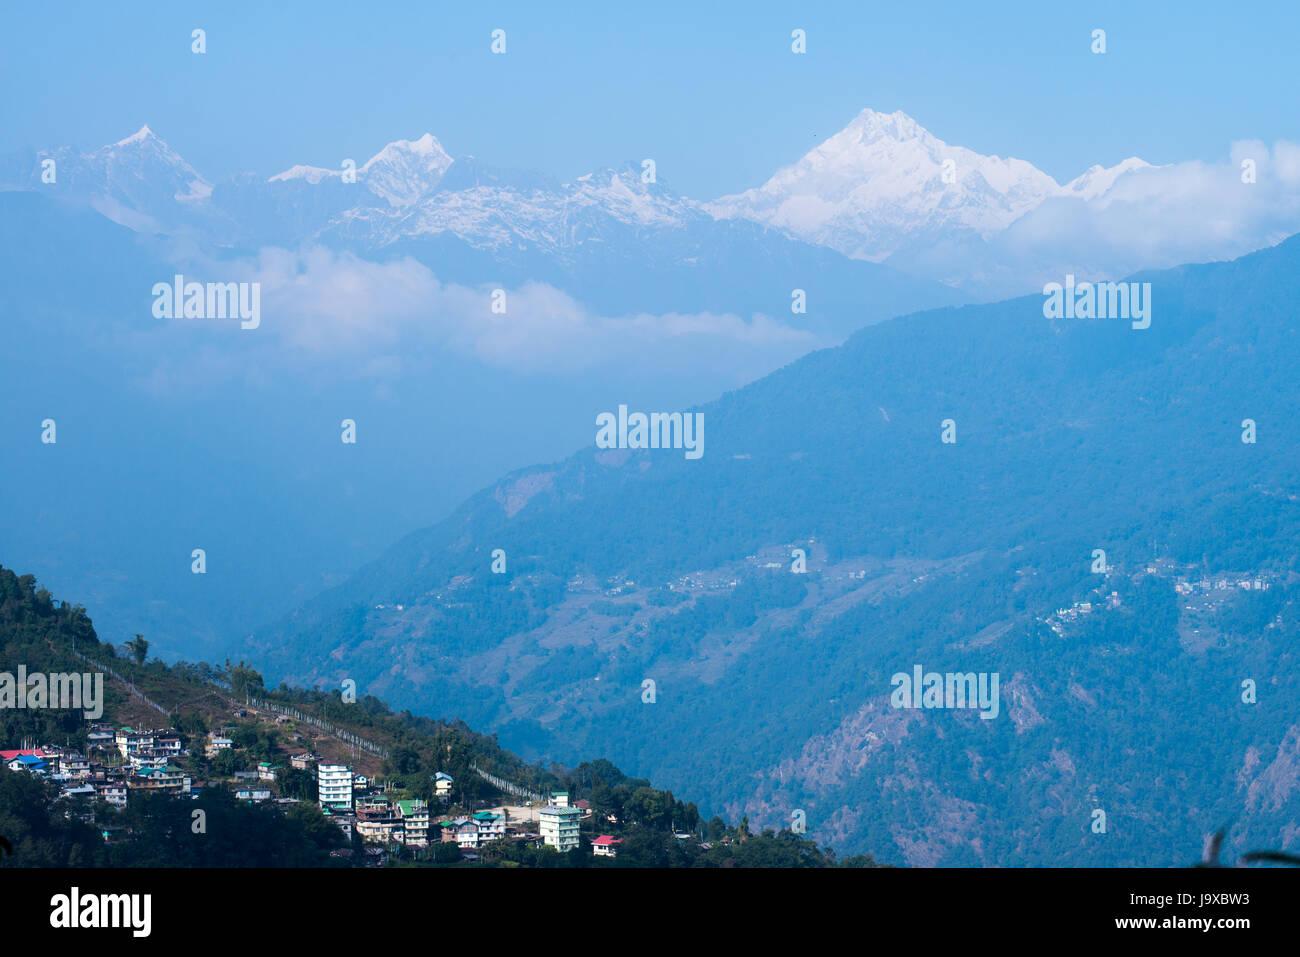 La ville de Gangtok et gamme Kangchenjunka vu de l'angle, Tashi Sikkim, Inde Photo Stock